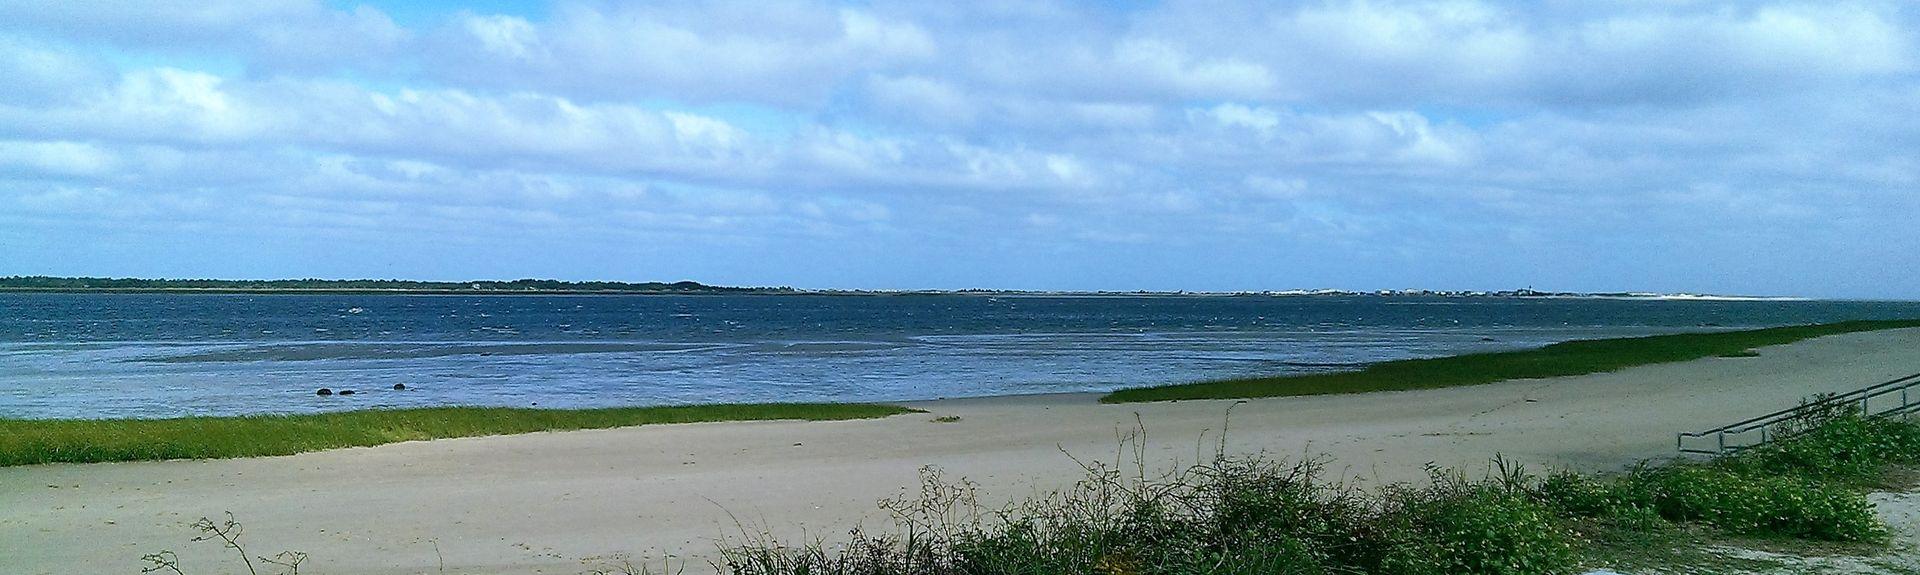 Skaket Beach, Orleans, Massachusetts, United States of America